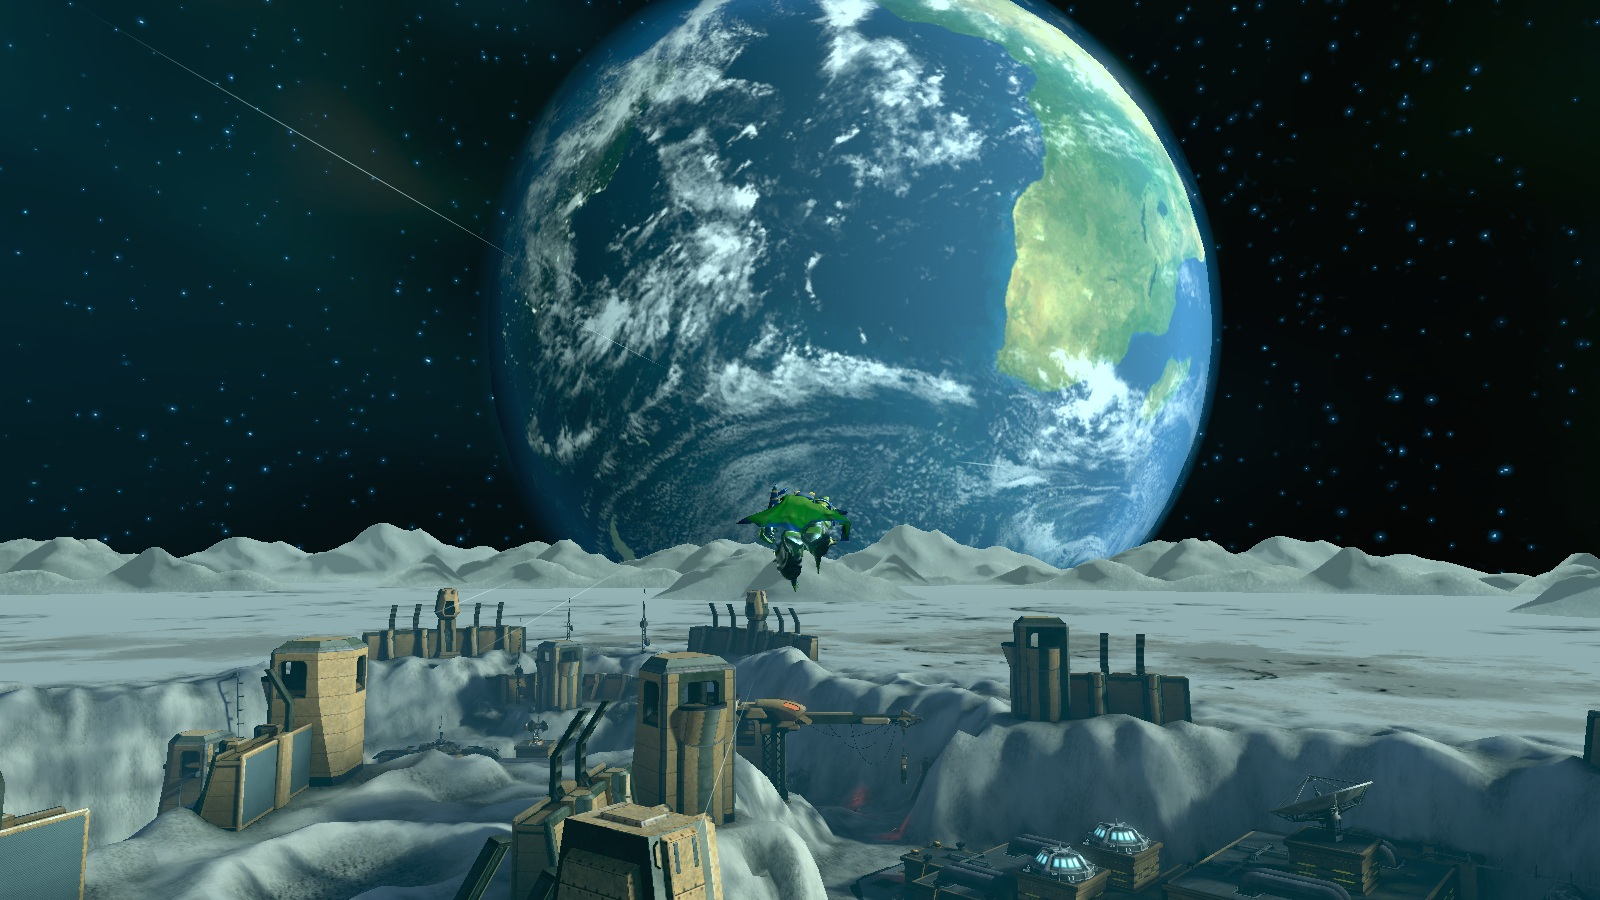 moon base online - photo #6